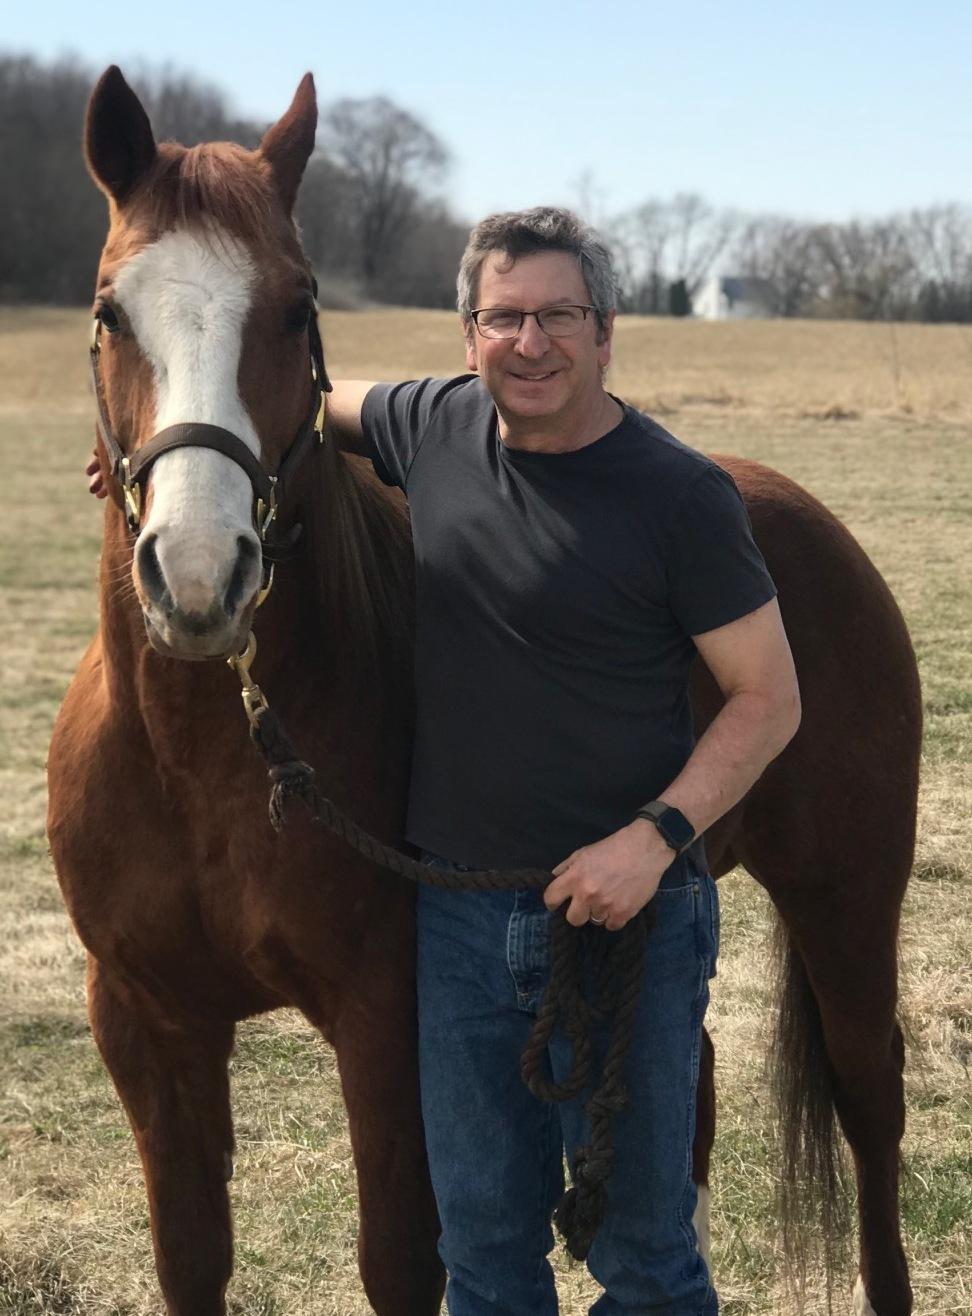 Jim Chiapetta, Achieve Equine Principal